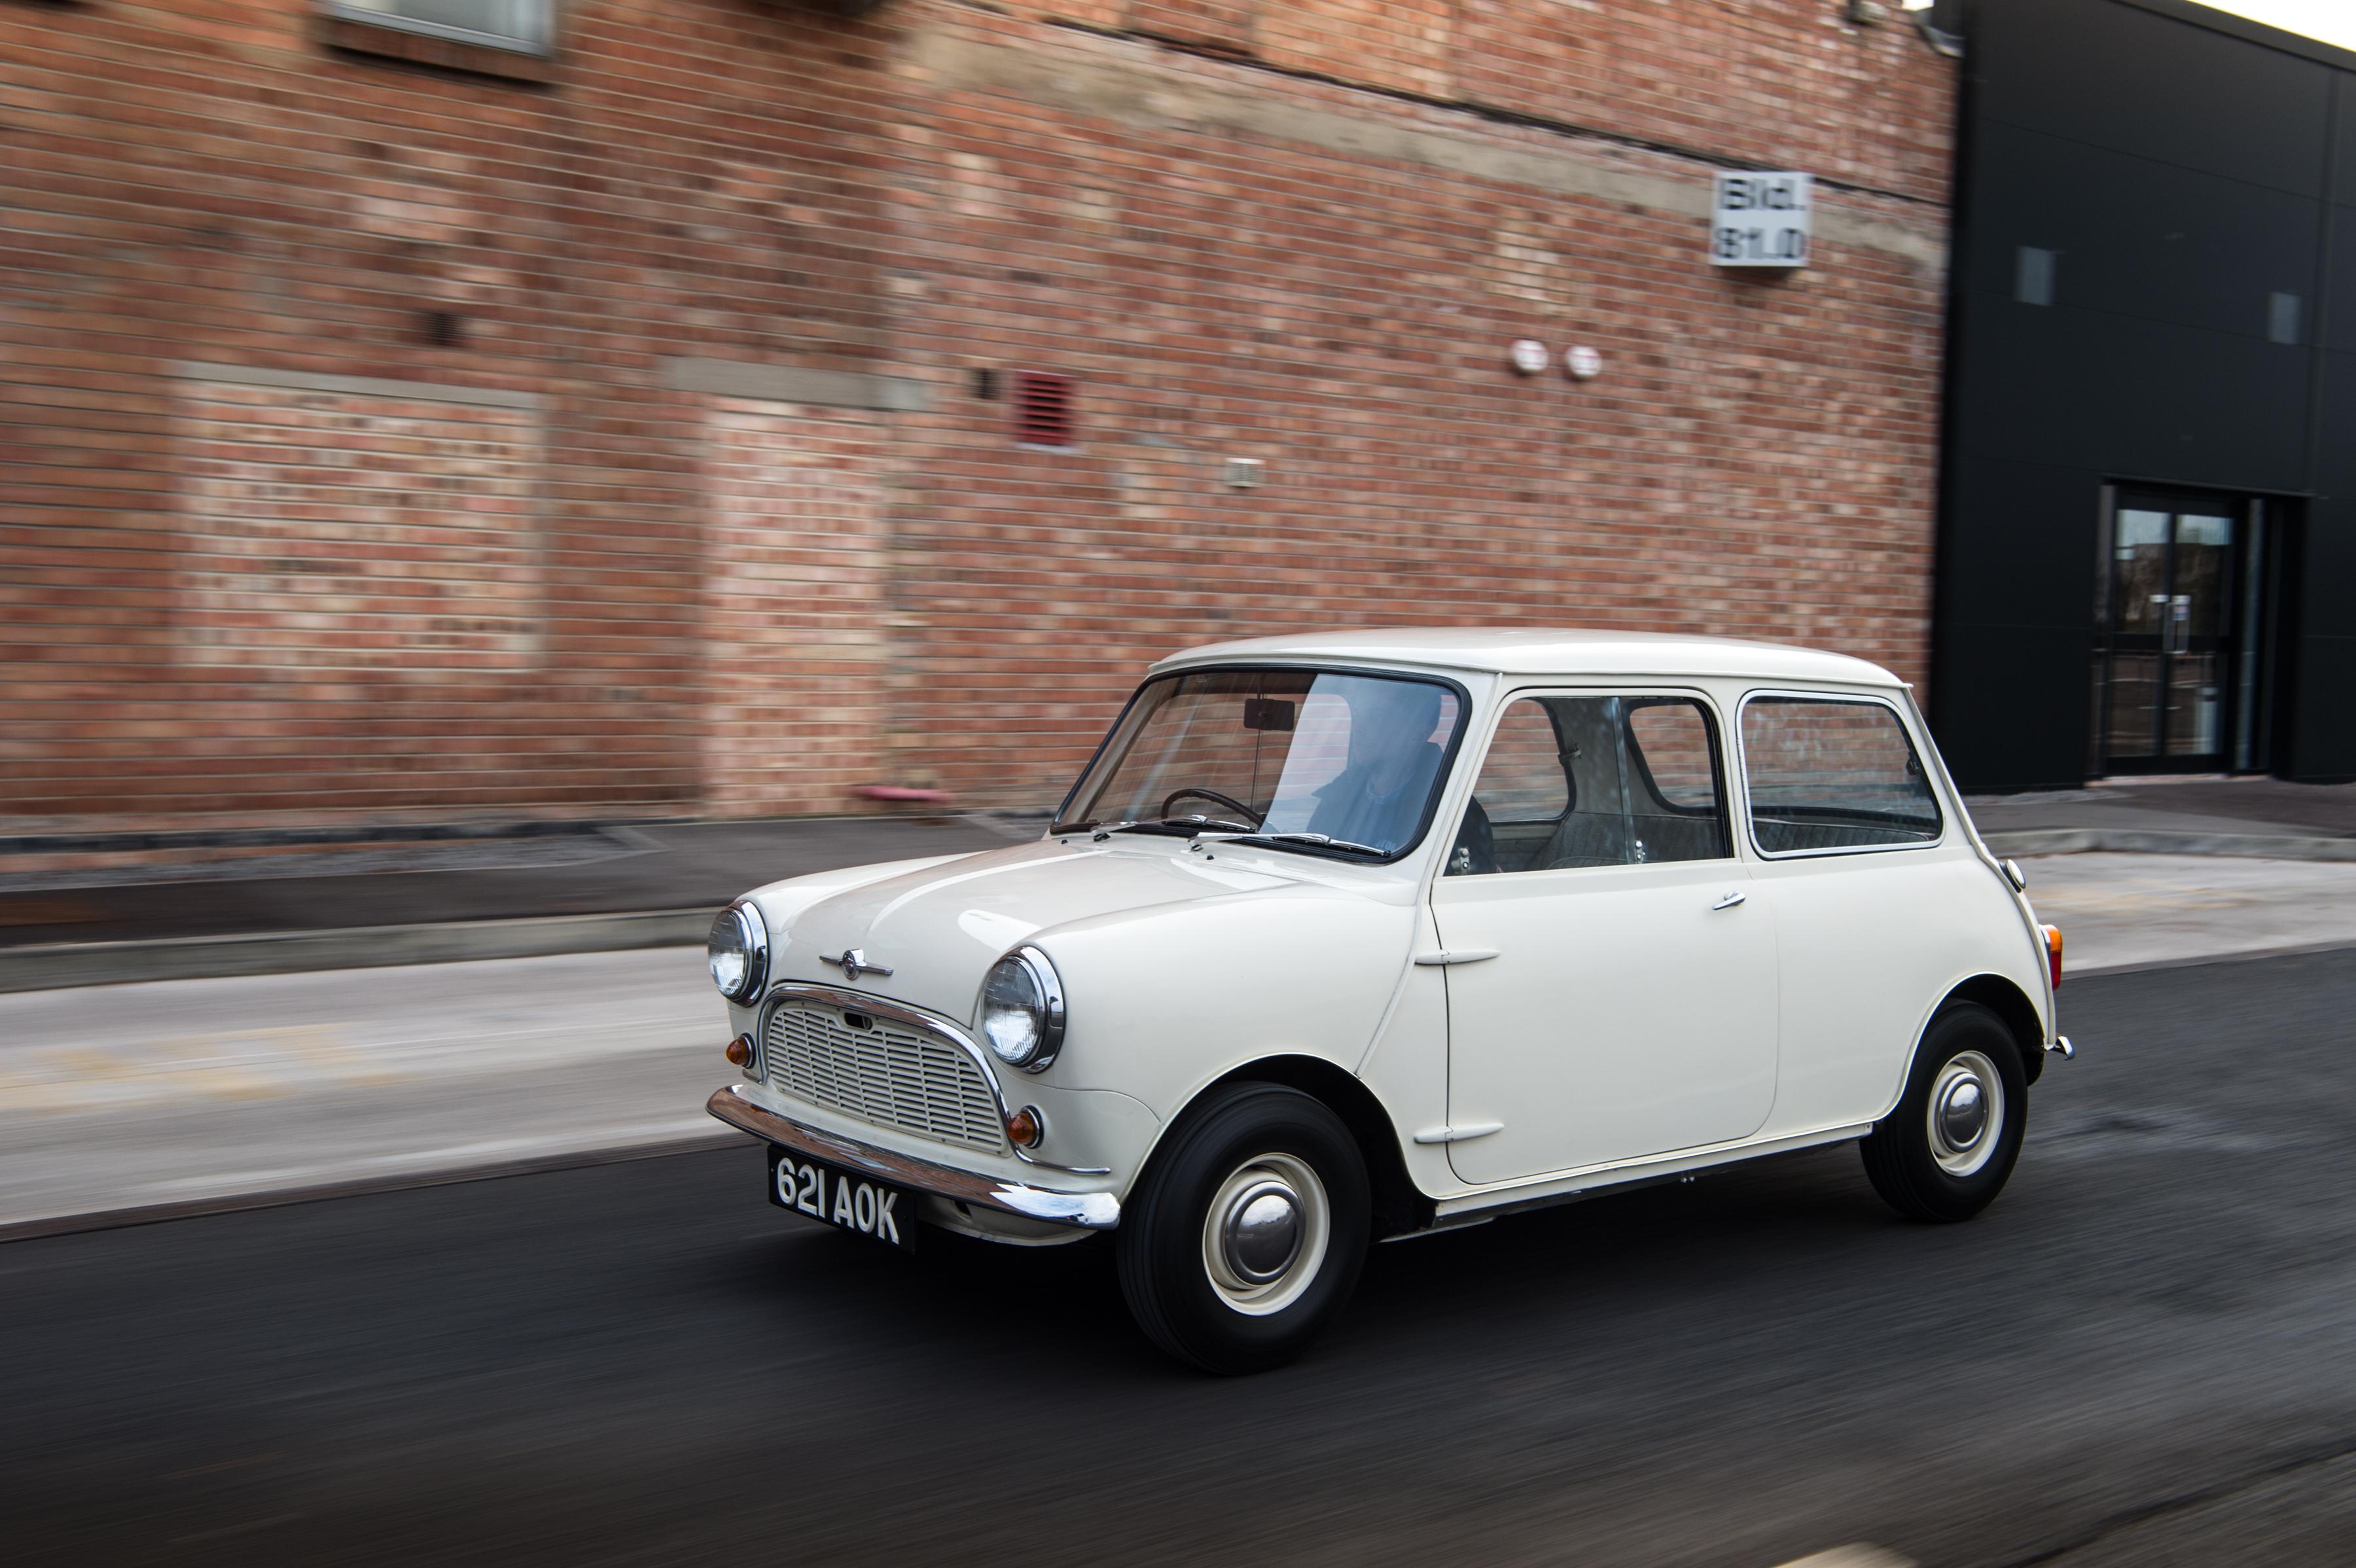 1959 Morris Mini Minor 533095 Best Quality Free High Resolution